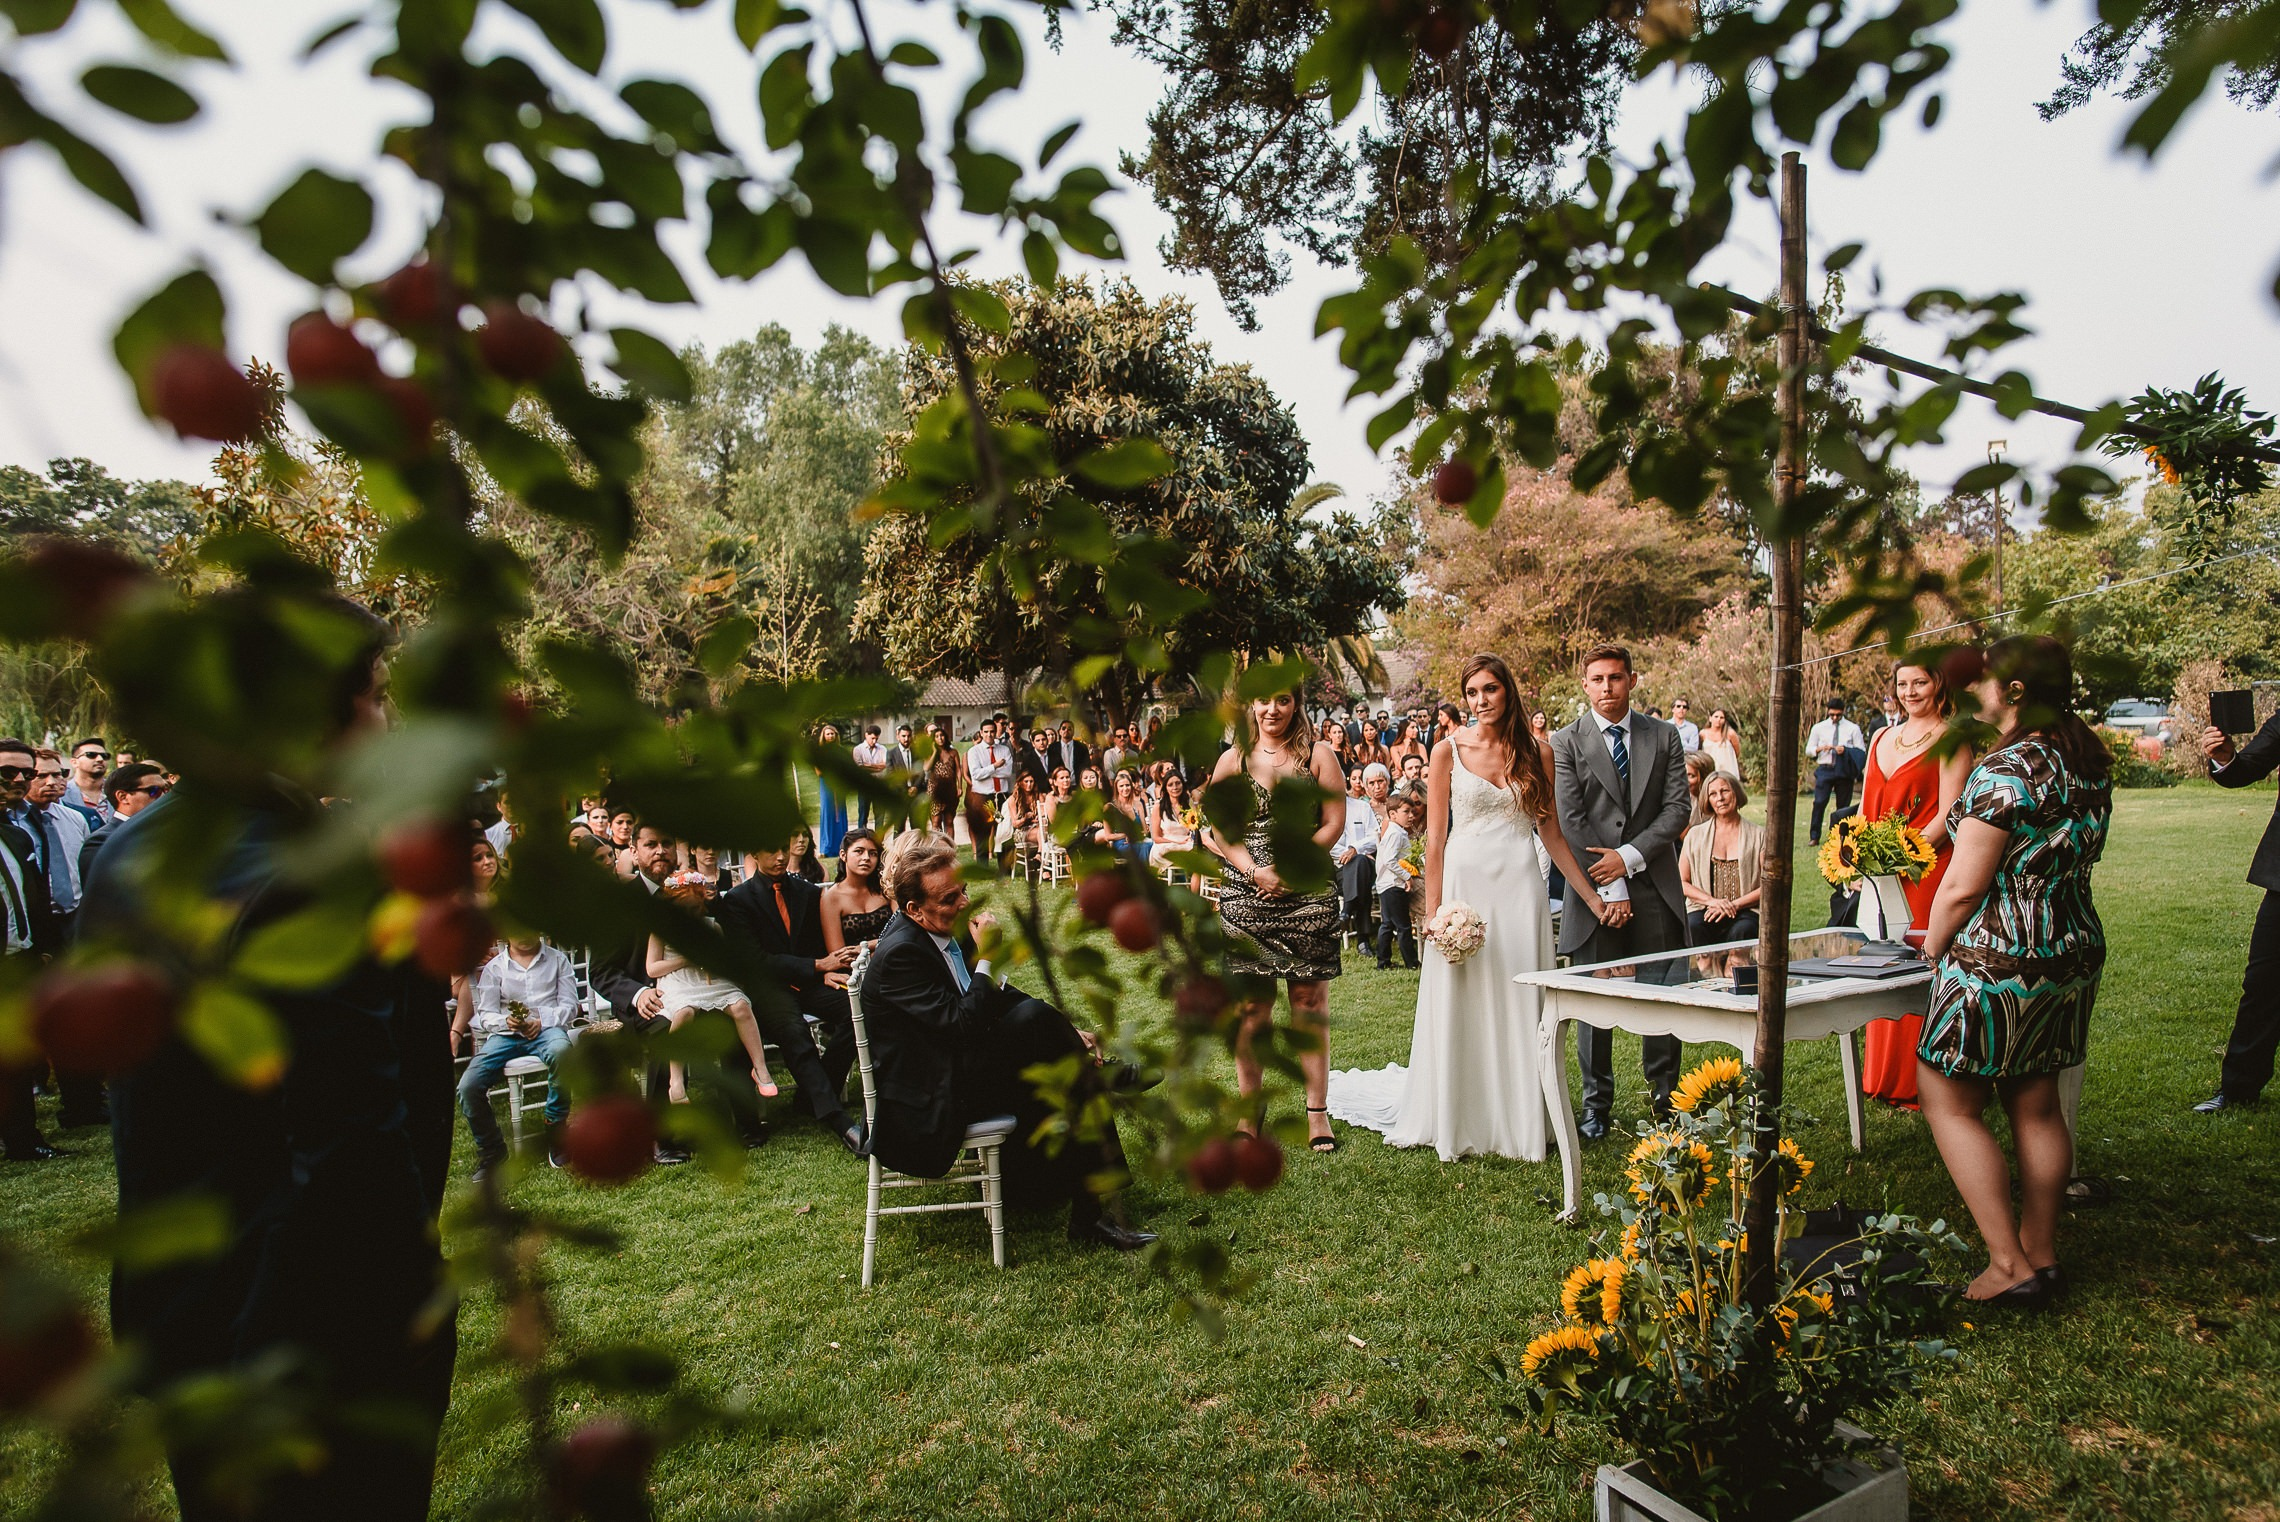 casona-aldunate-wedding-planner-chile-fotografia-de-matrimonios-fotografo-deborah-dantzoff